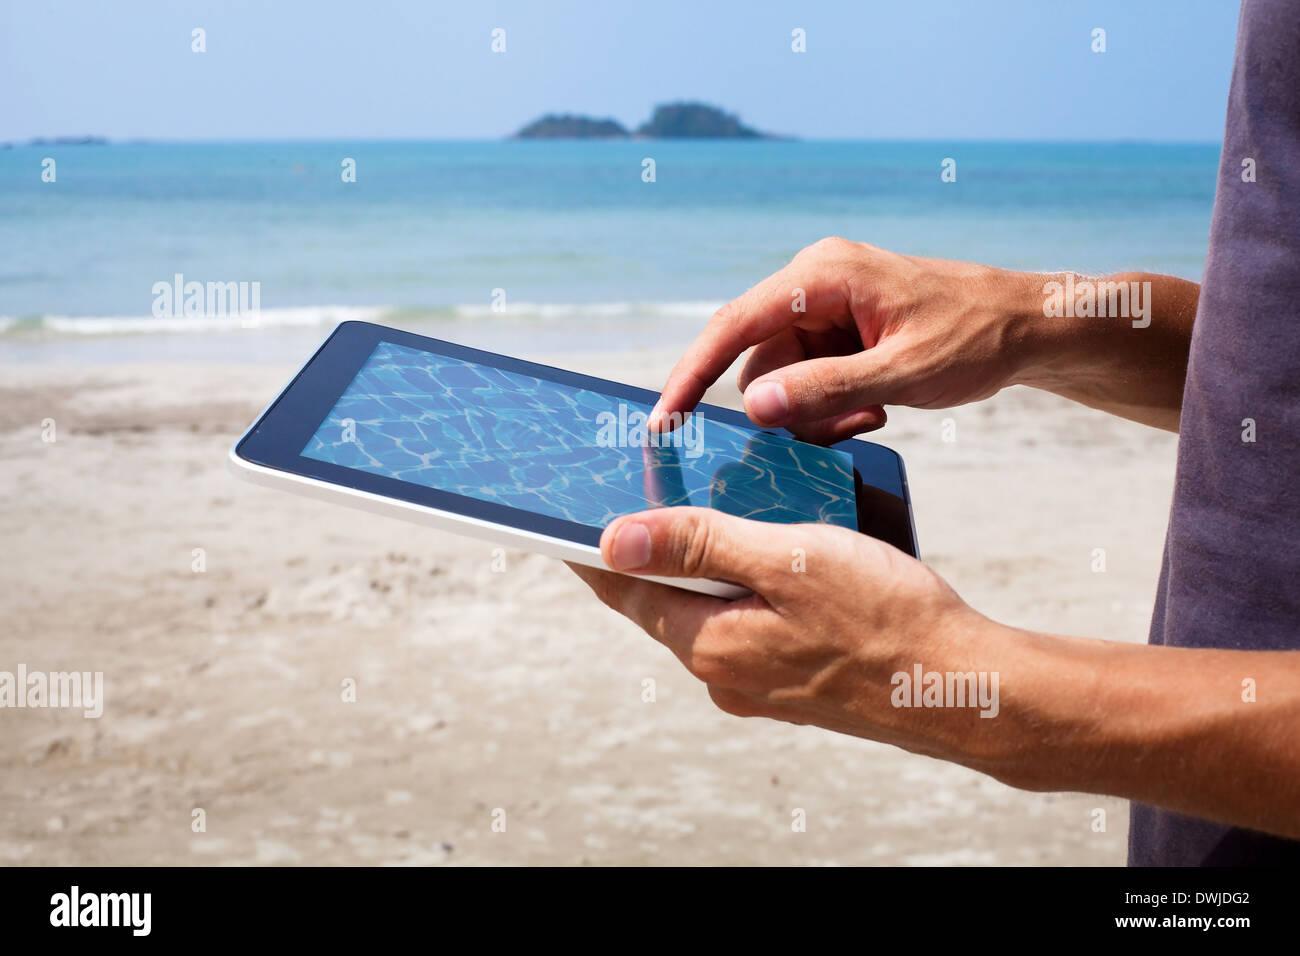 Hände mit Tablet am Strand Stockfoto